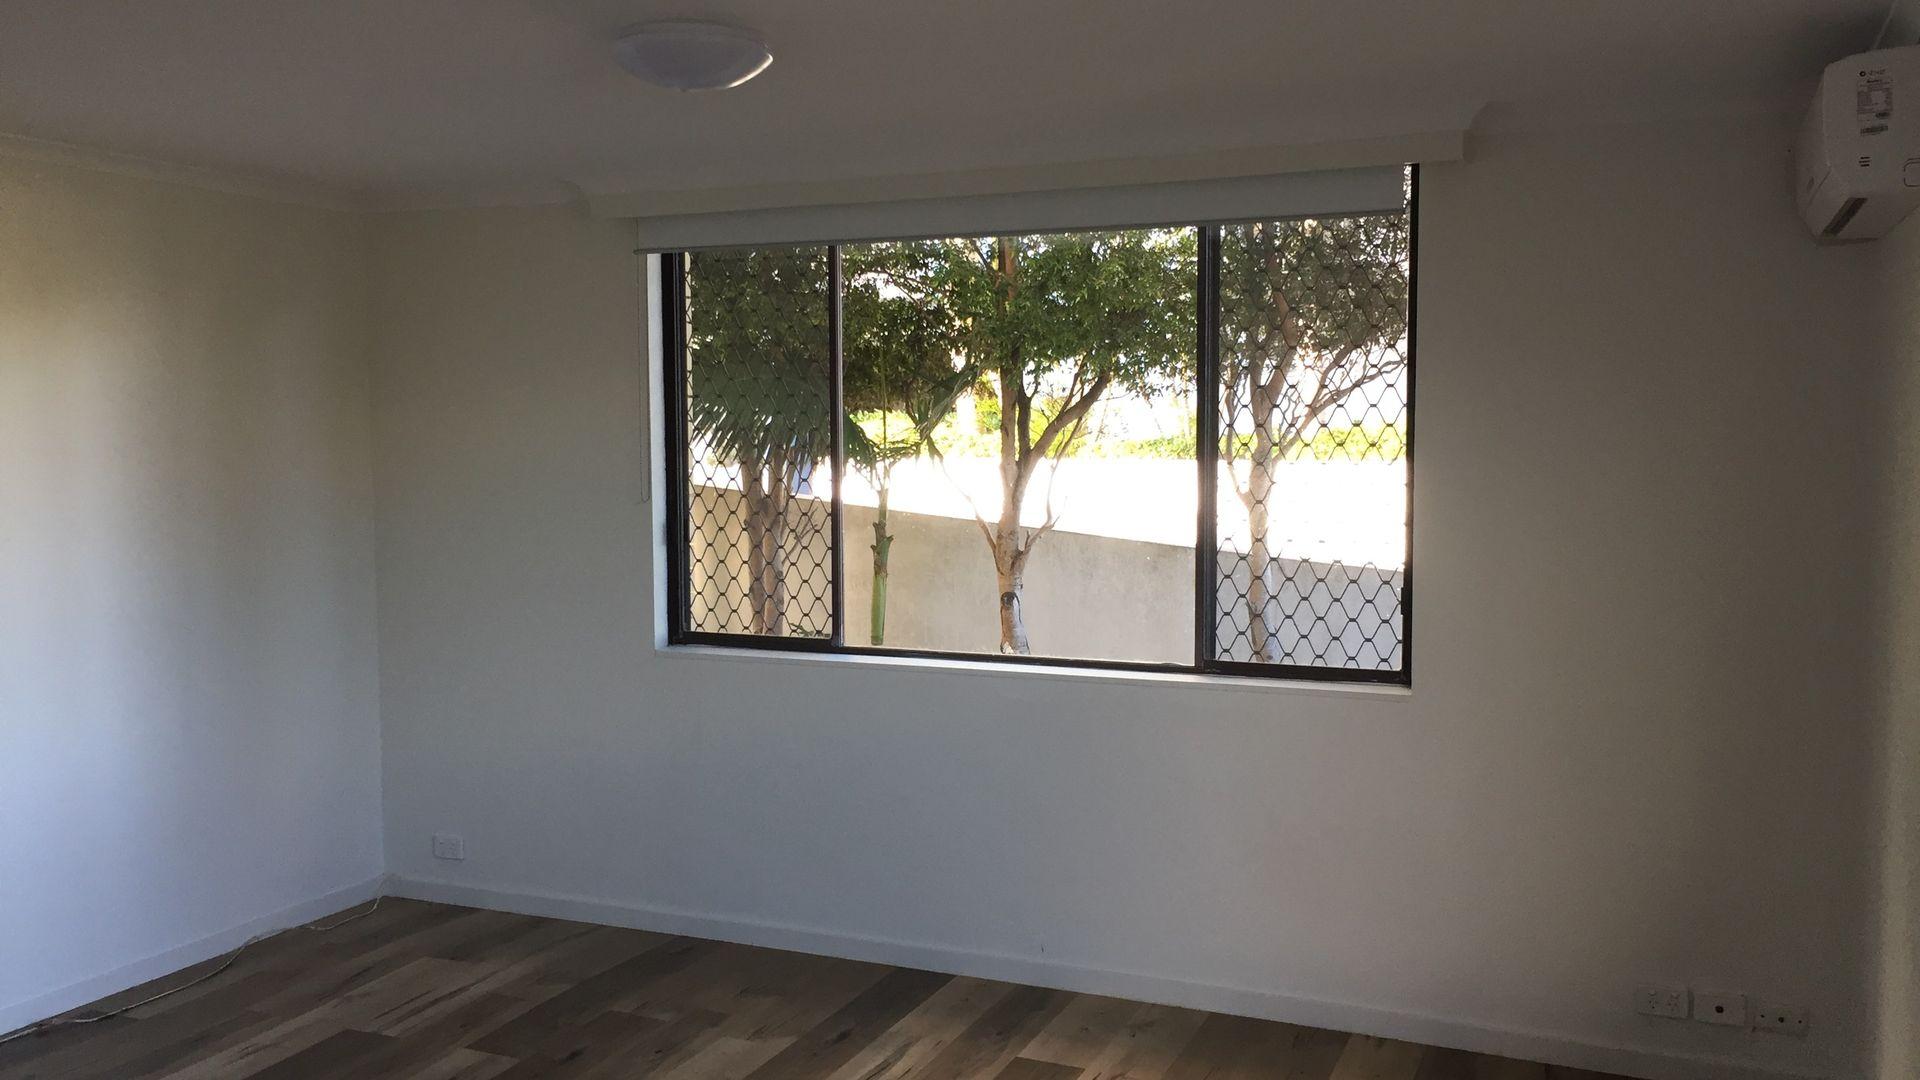 5/2619 Gold Coast Highway, Corner Alexander Ave., Broadbeach QLD 4218, Image 2